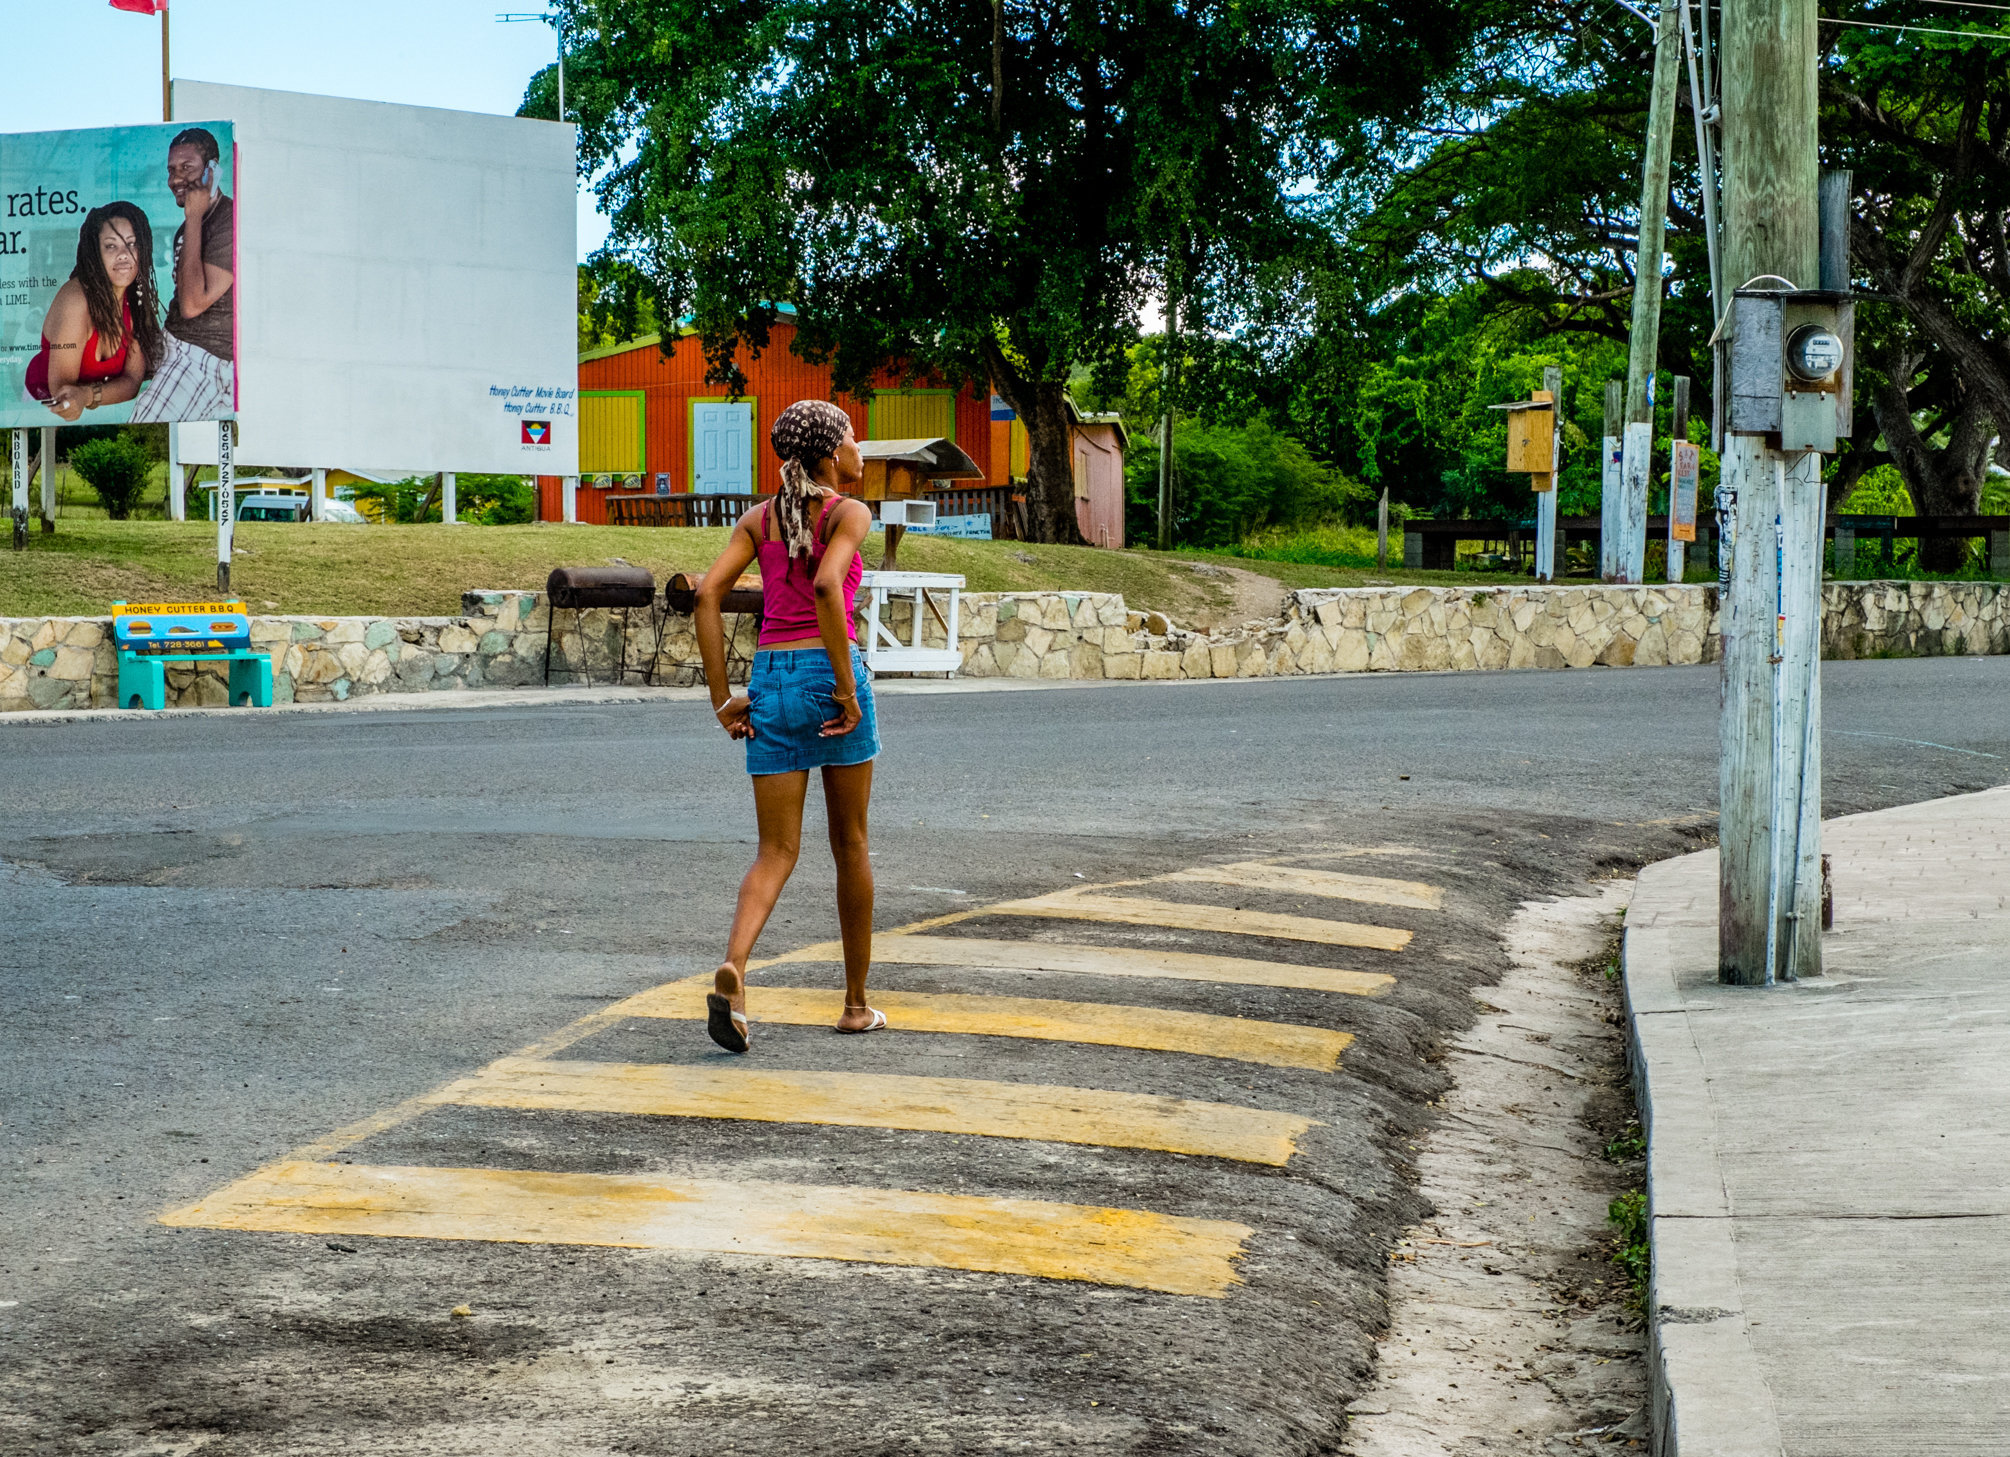 Caribbean, impressions-4694.jpg